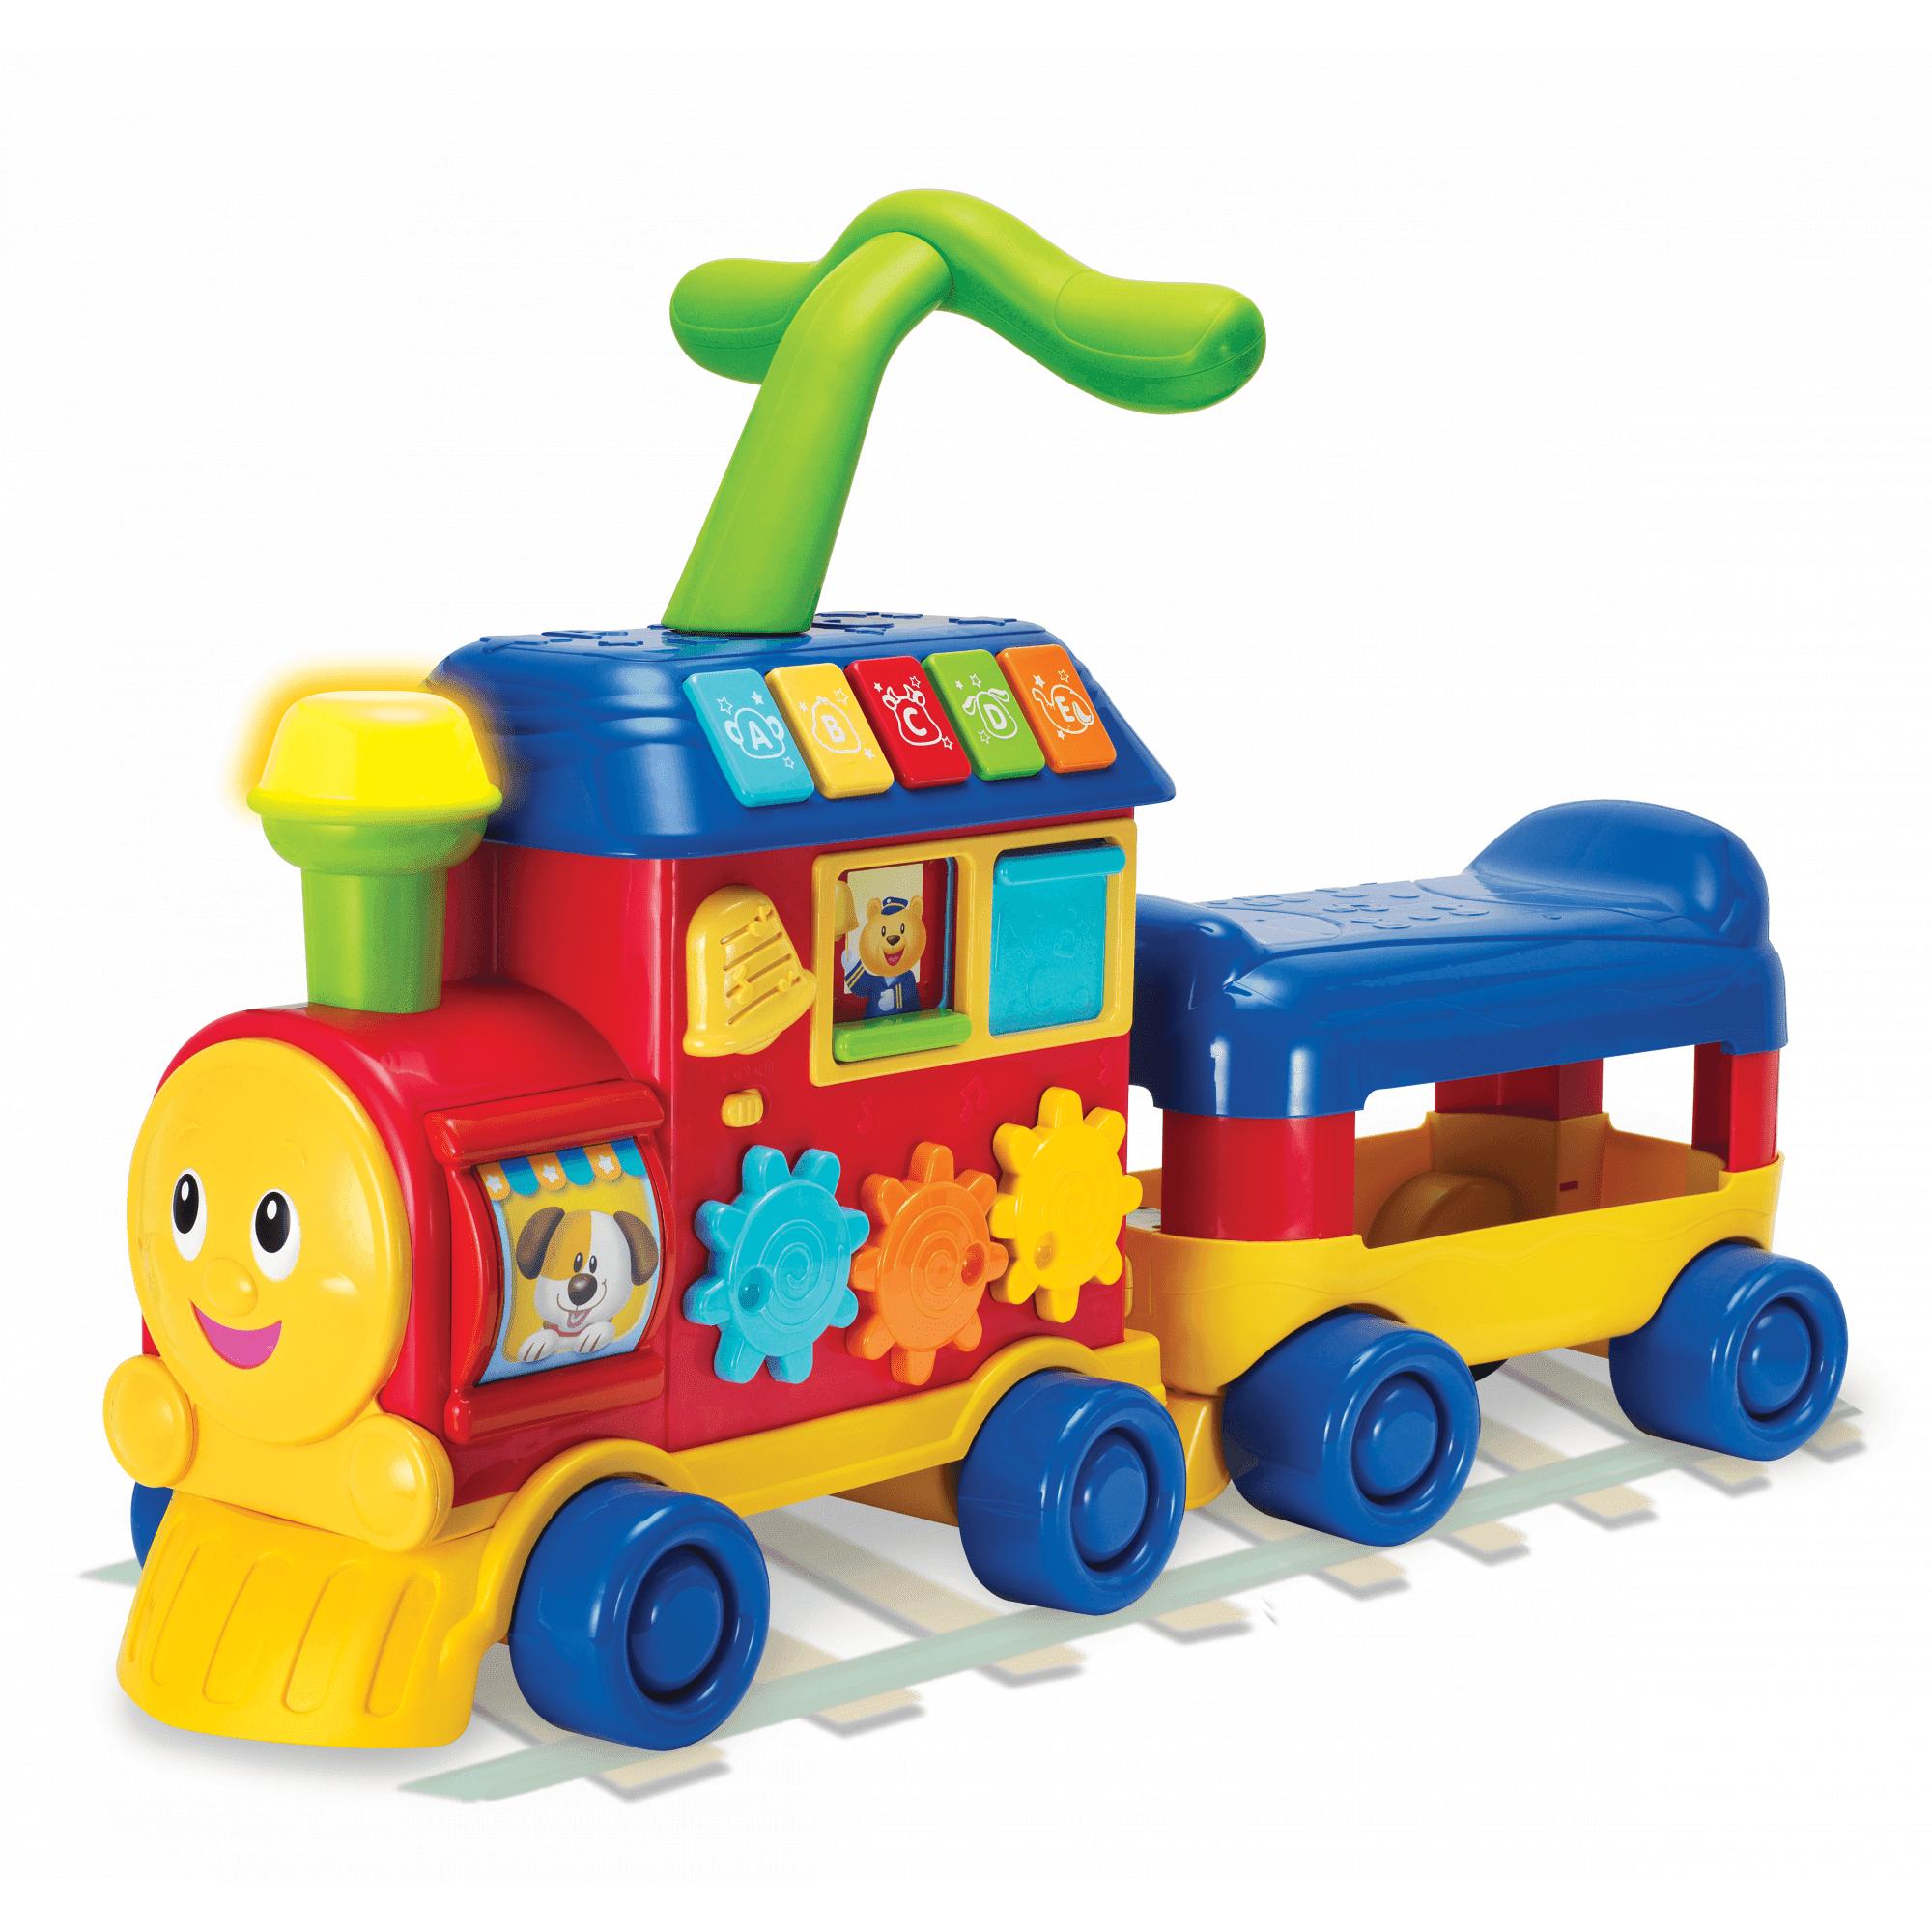 Walker Ride-On Learning Train by BRILLIANT BEGINNINGS